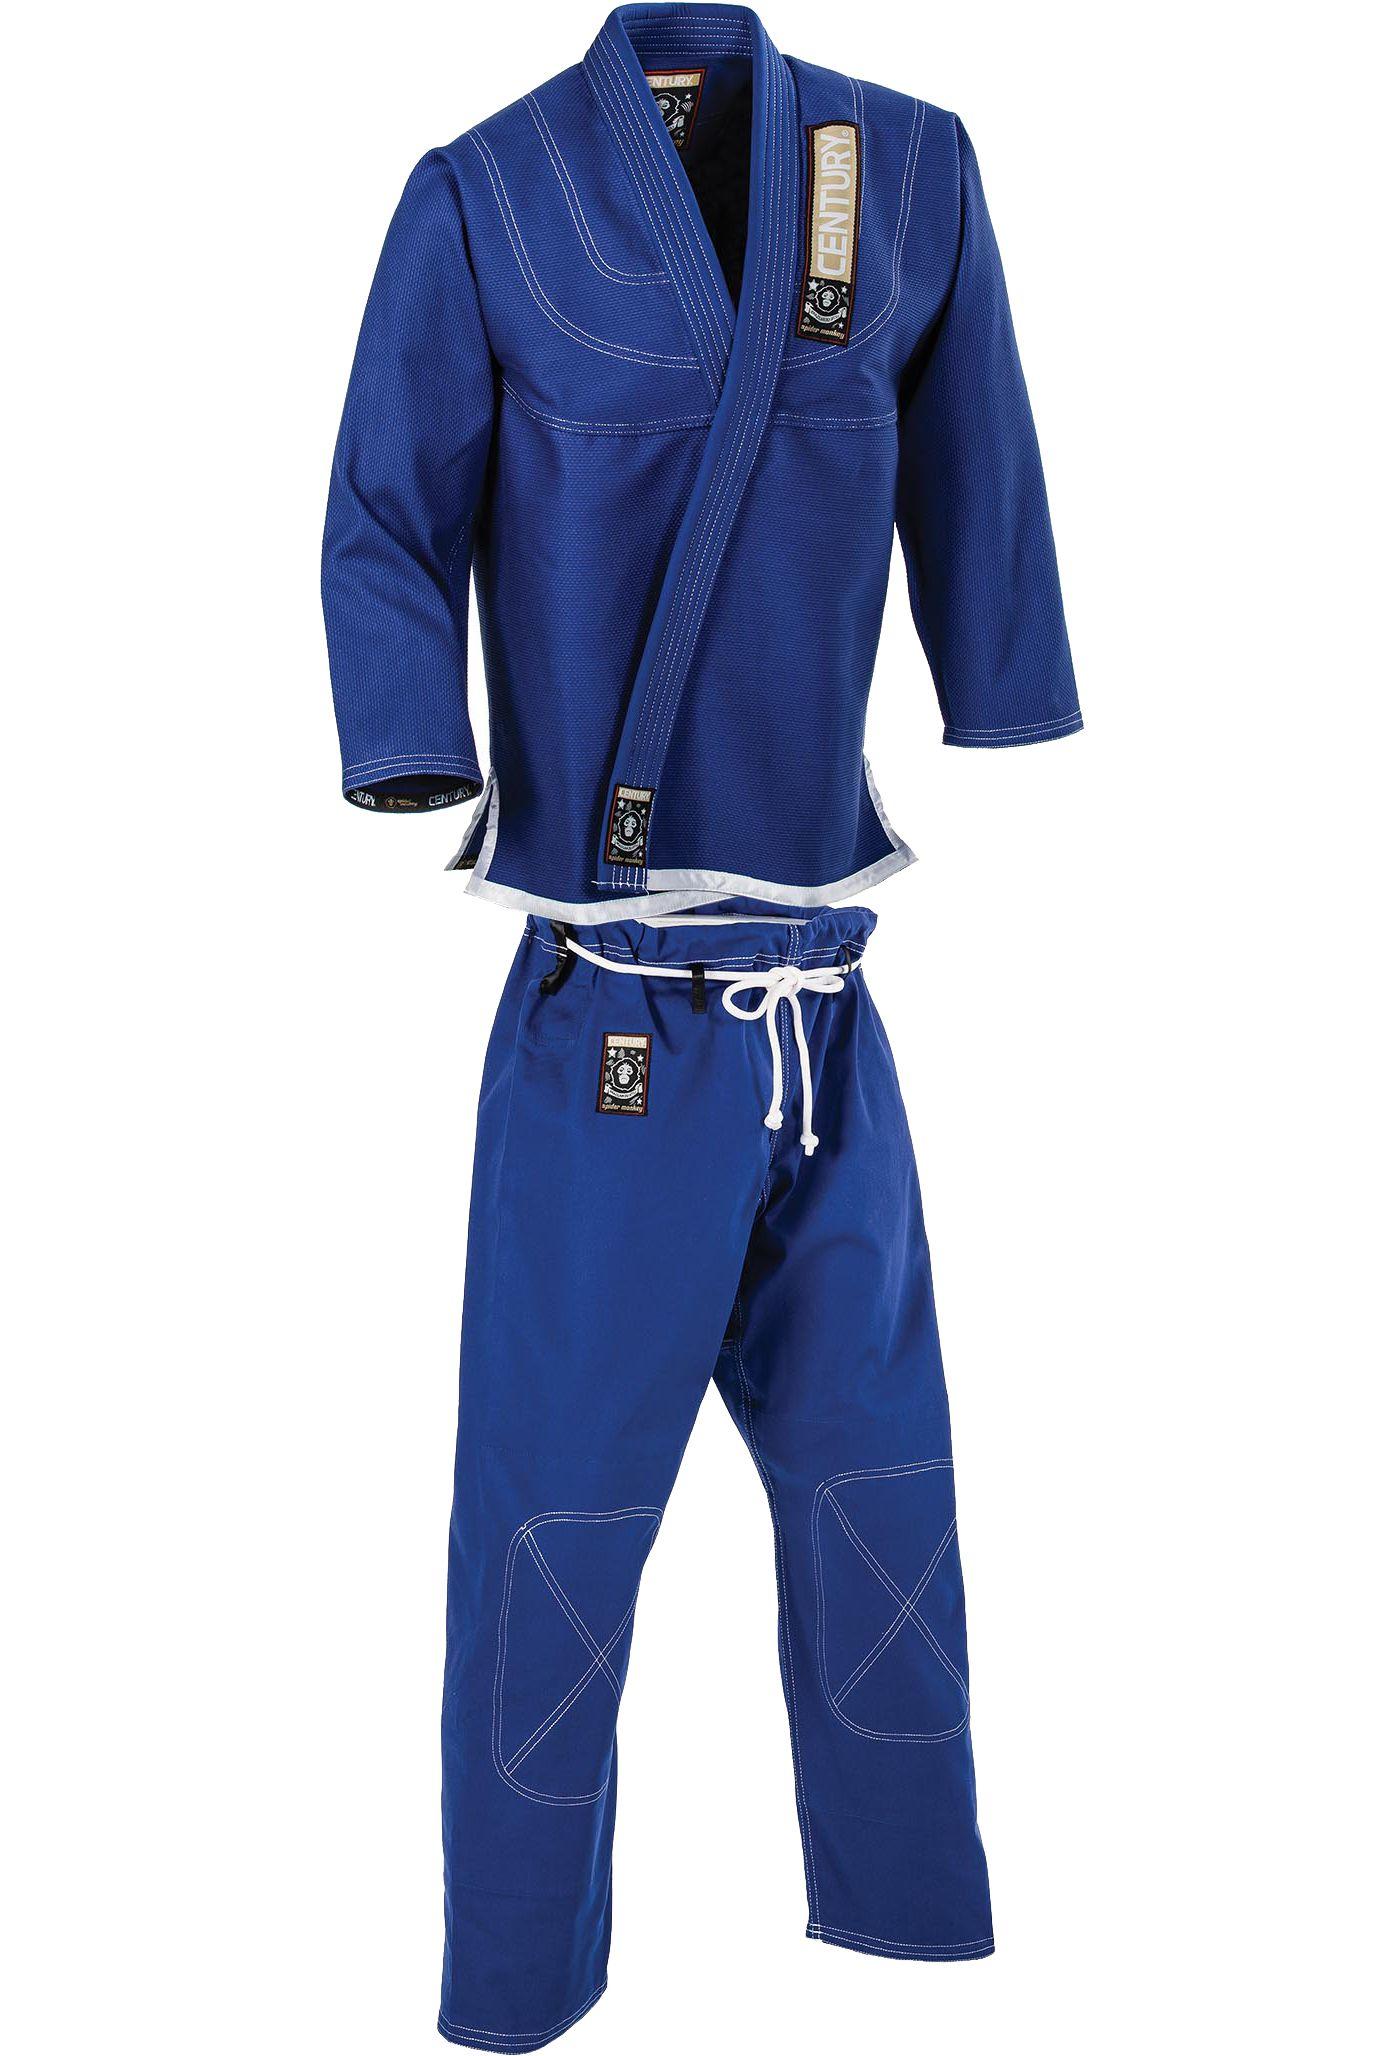 Century Youth Spider Monkey Brazilian Jiu-Jitsu Uniform